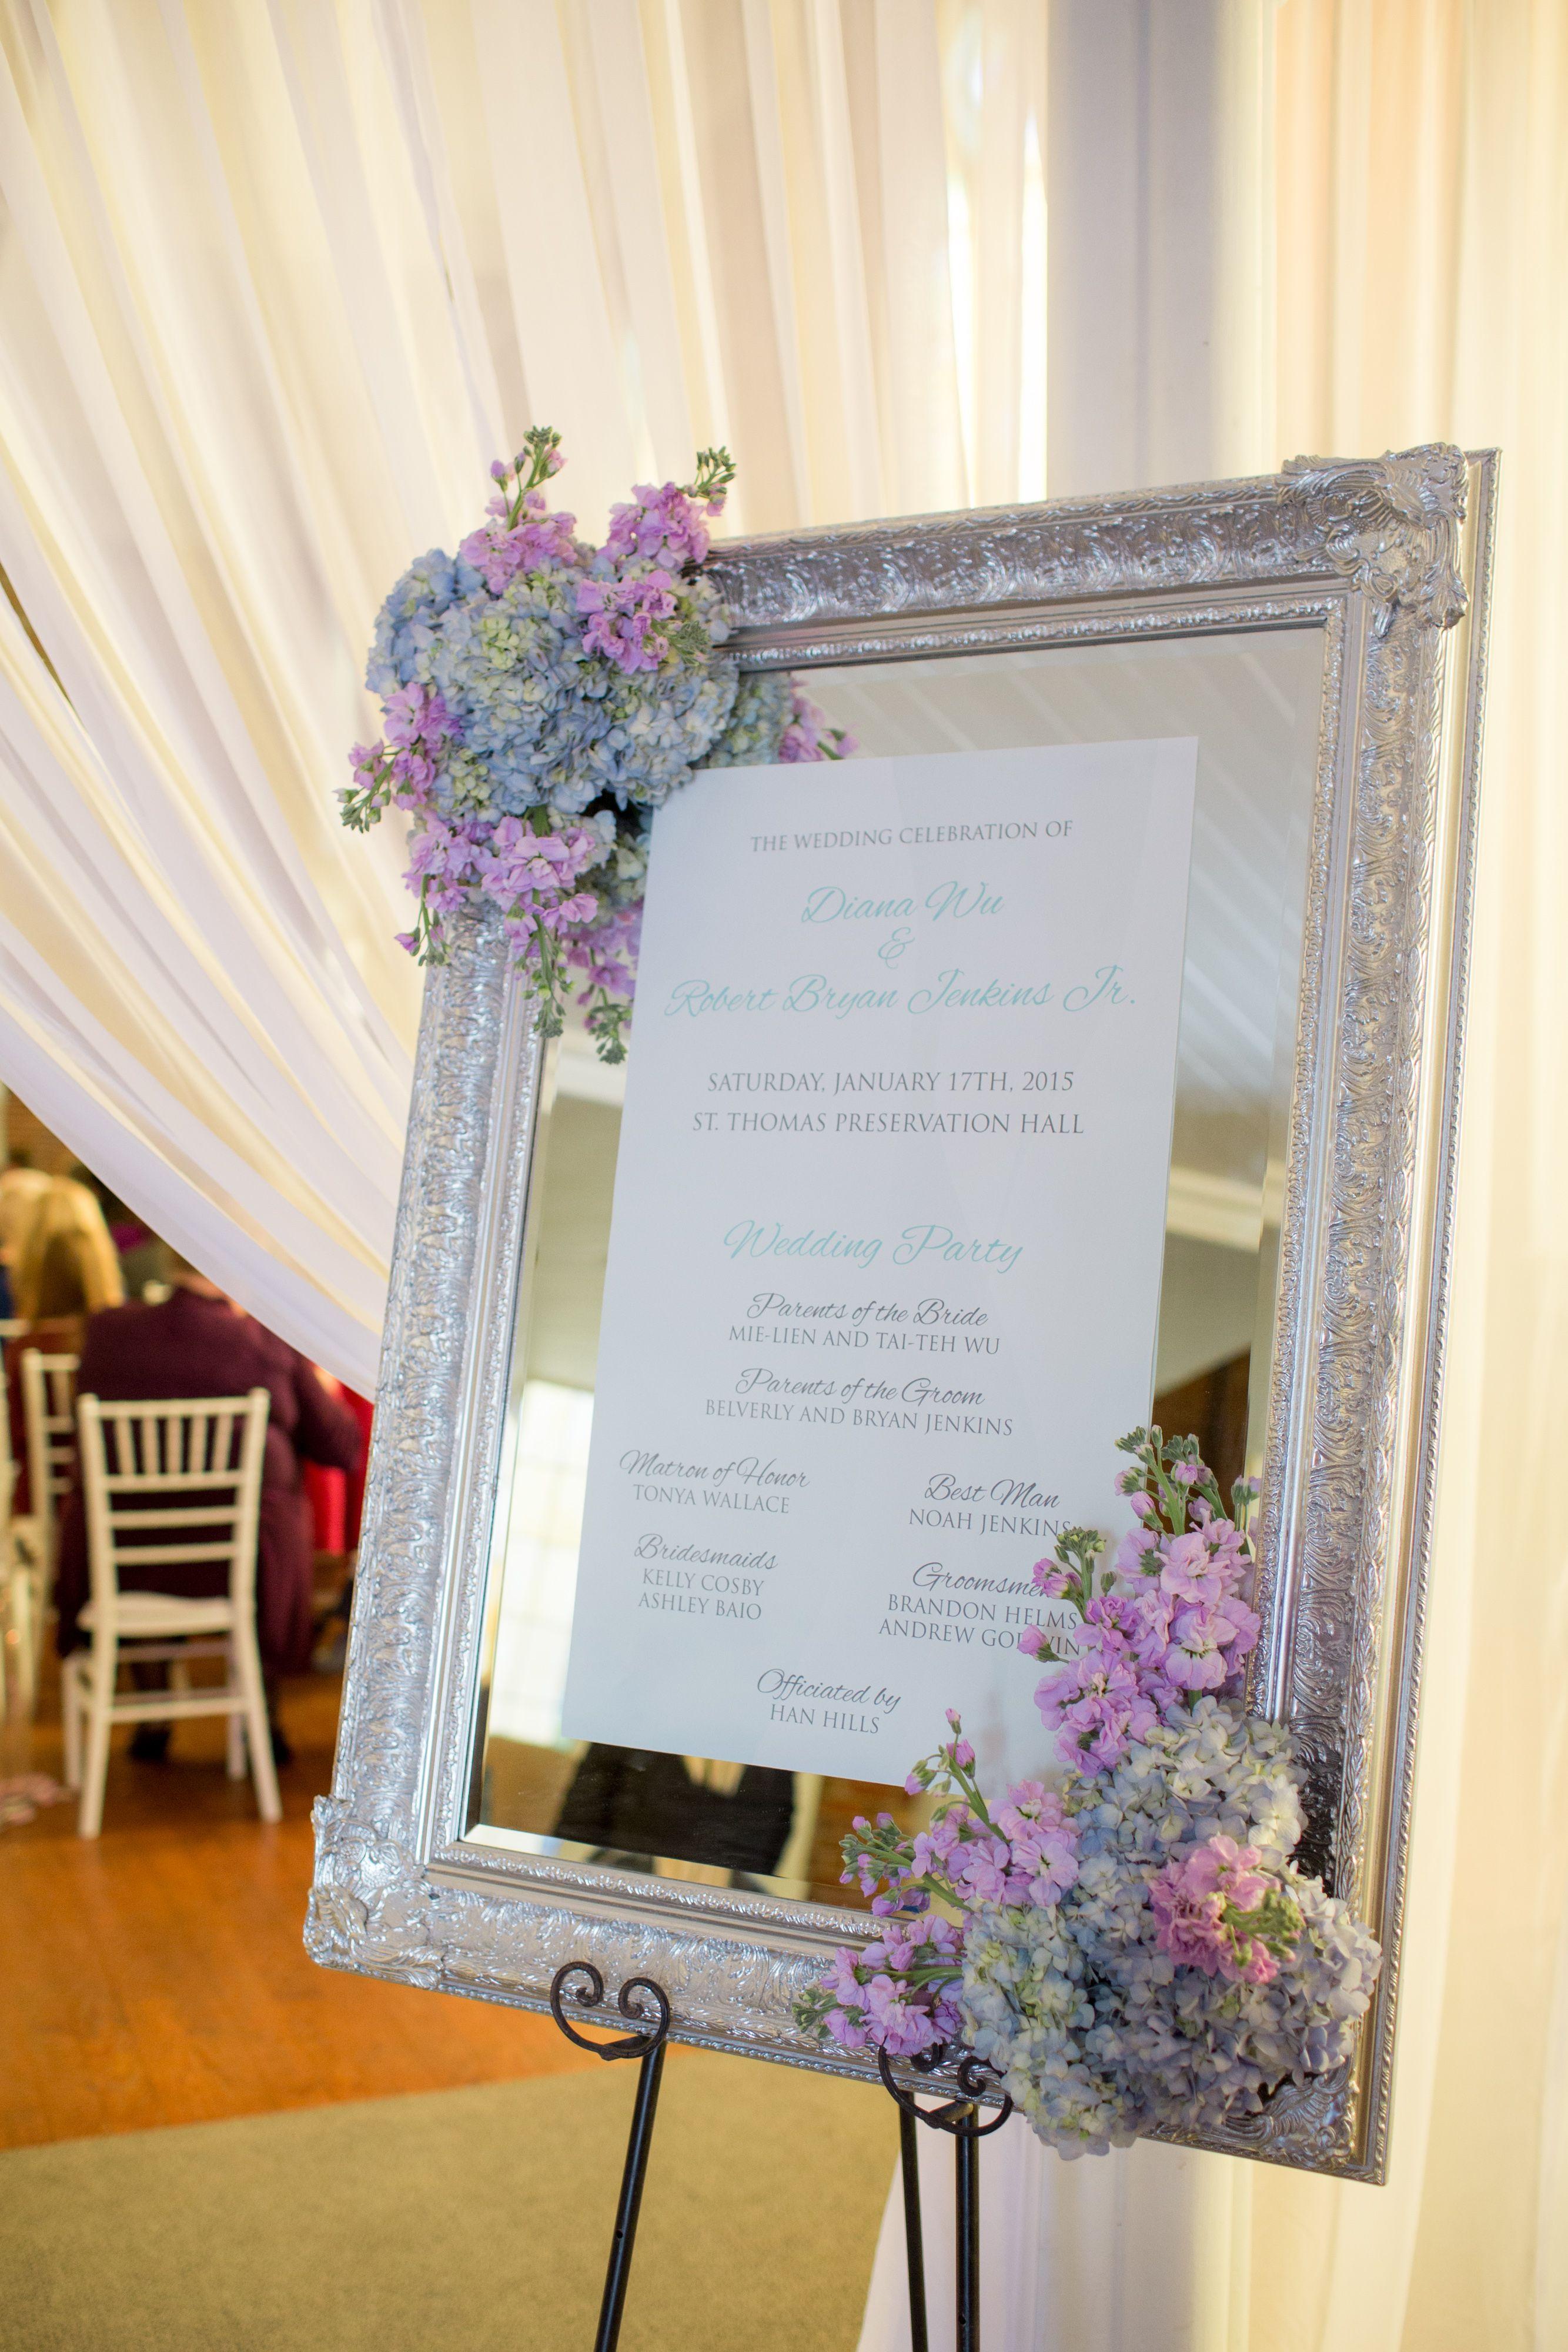 Vintage Silver-Framed Mirror Wedding Ceremony Program | Weddings ...